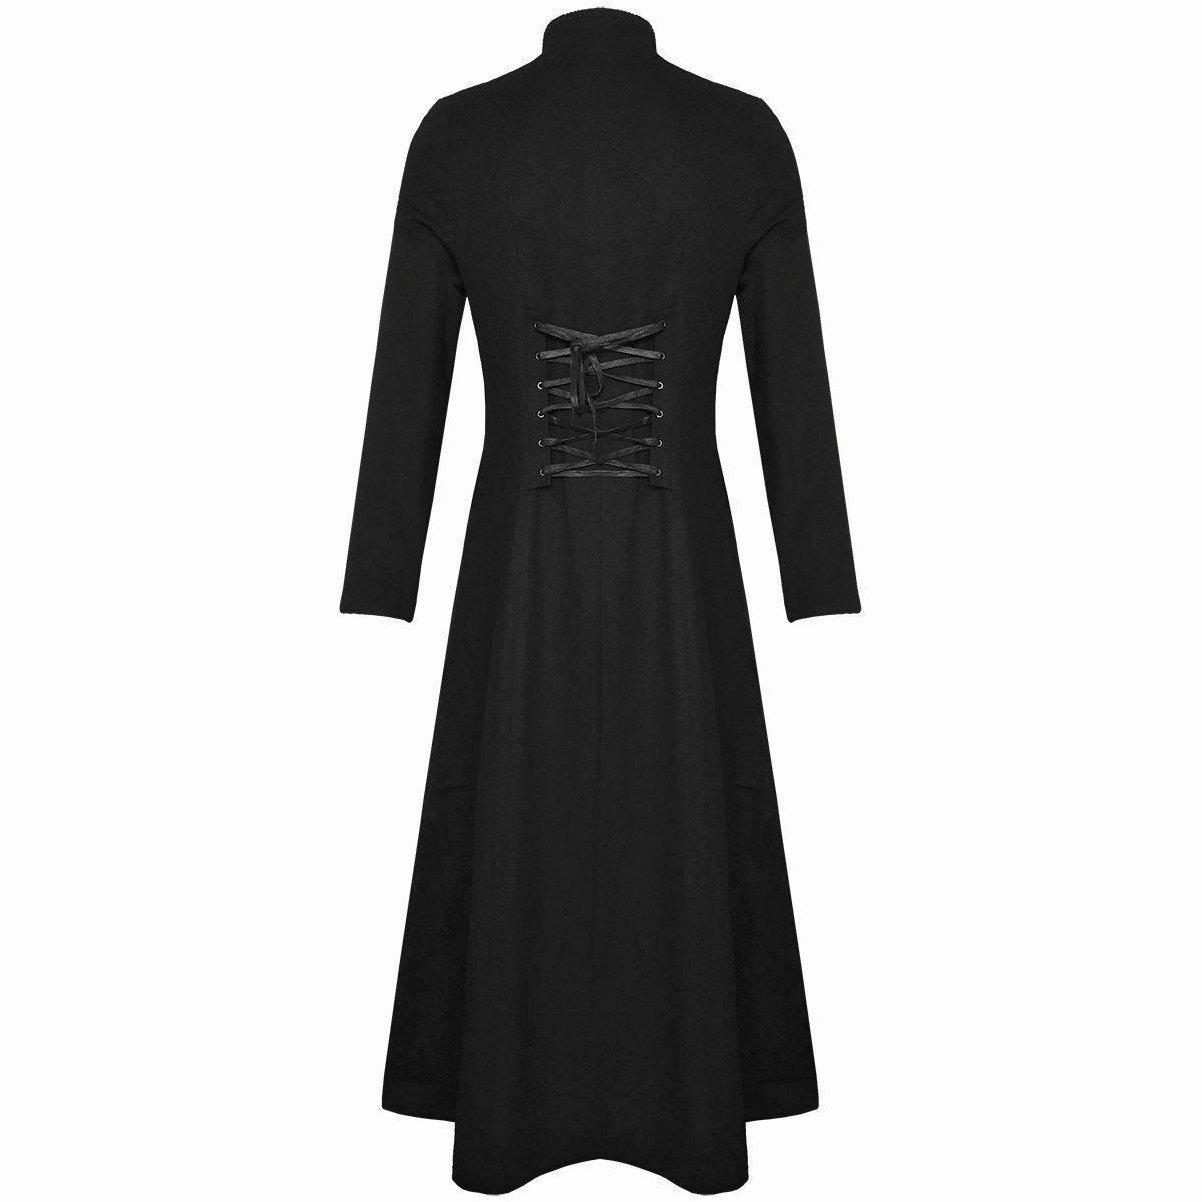 DARKROCK Men's Steampunk Military TRENCH COAT Long Jacket Black (2)